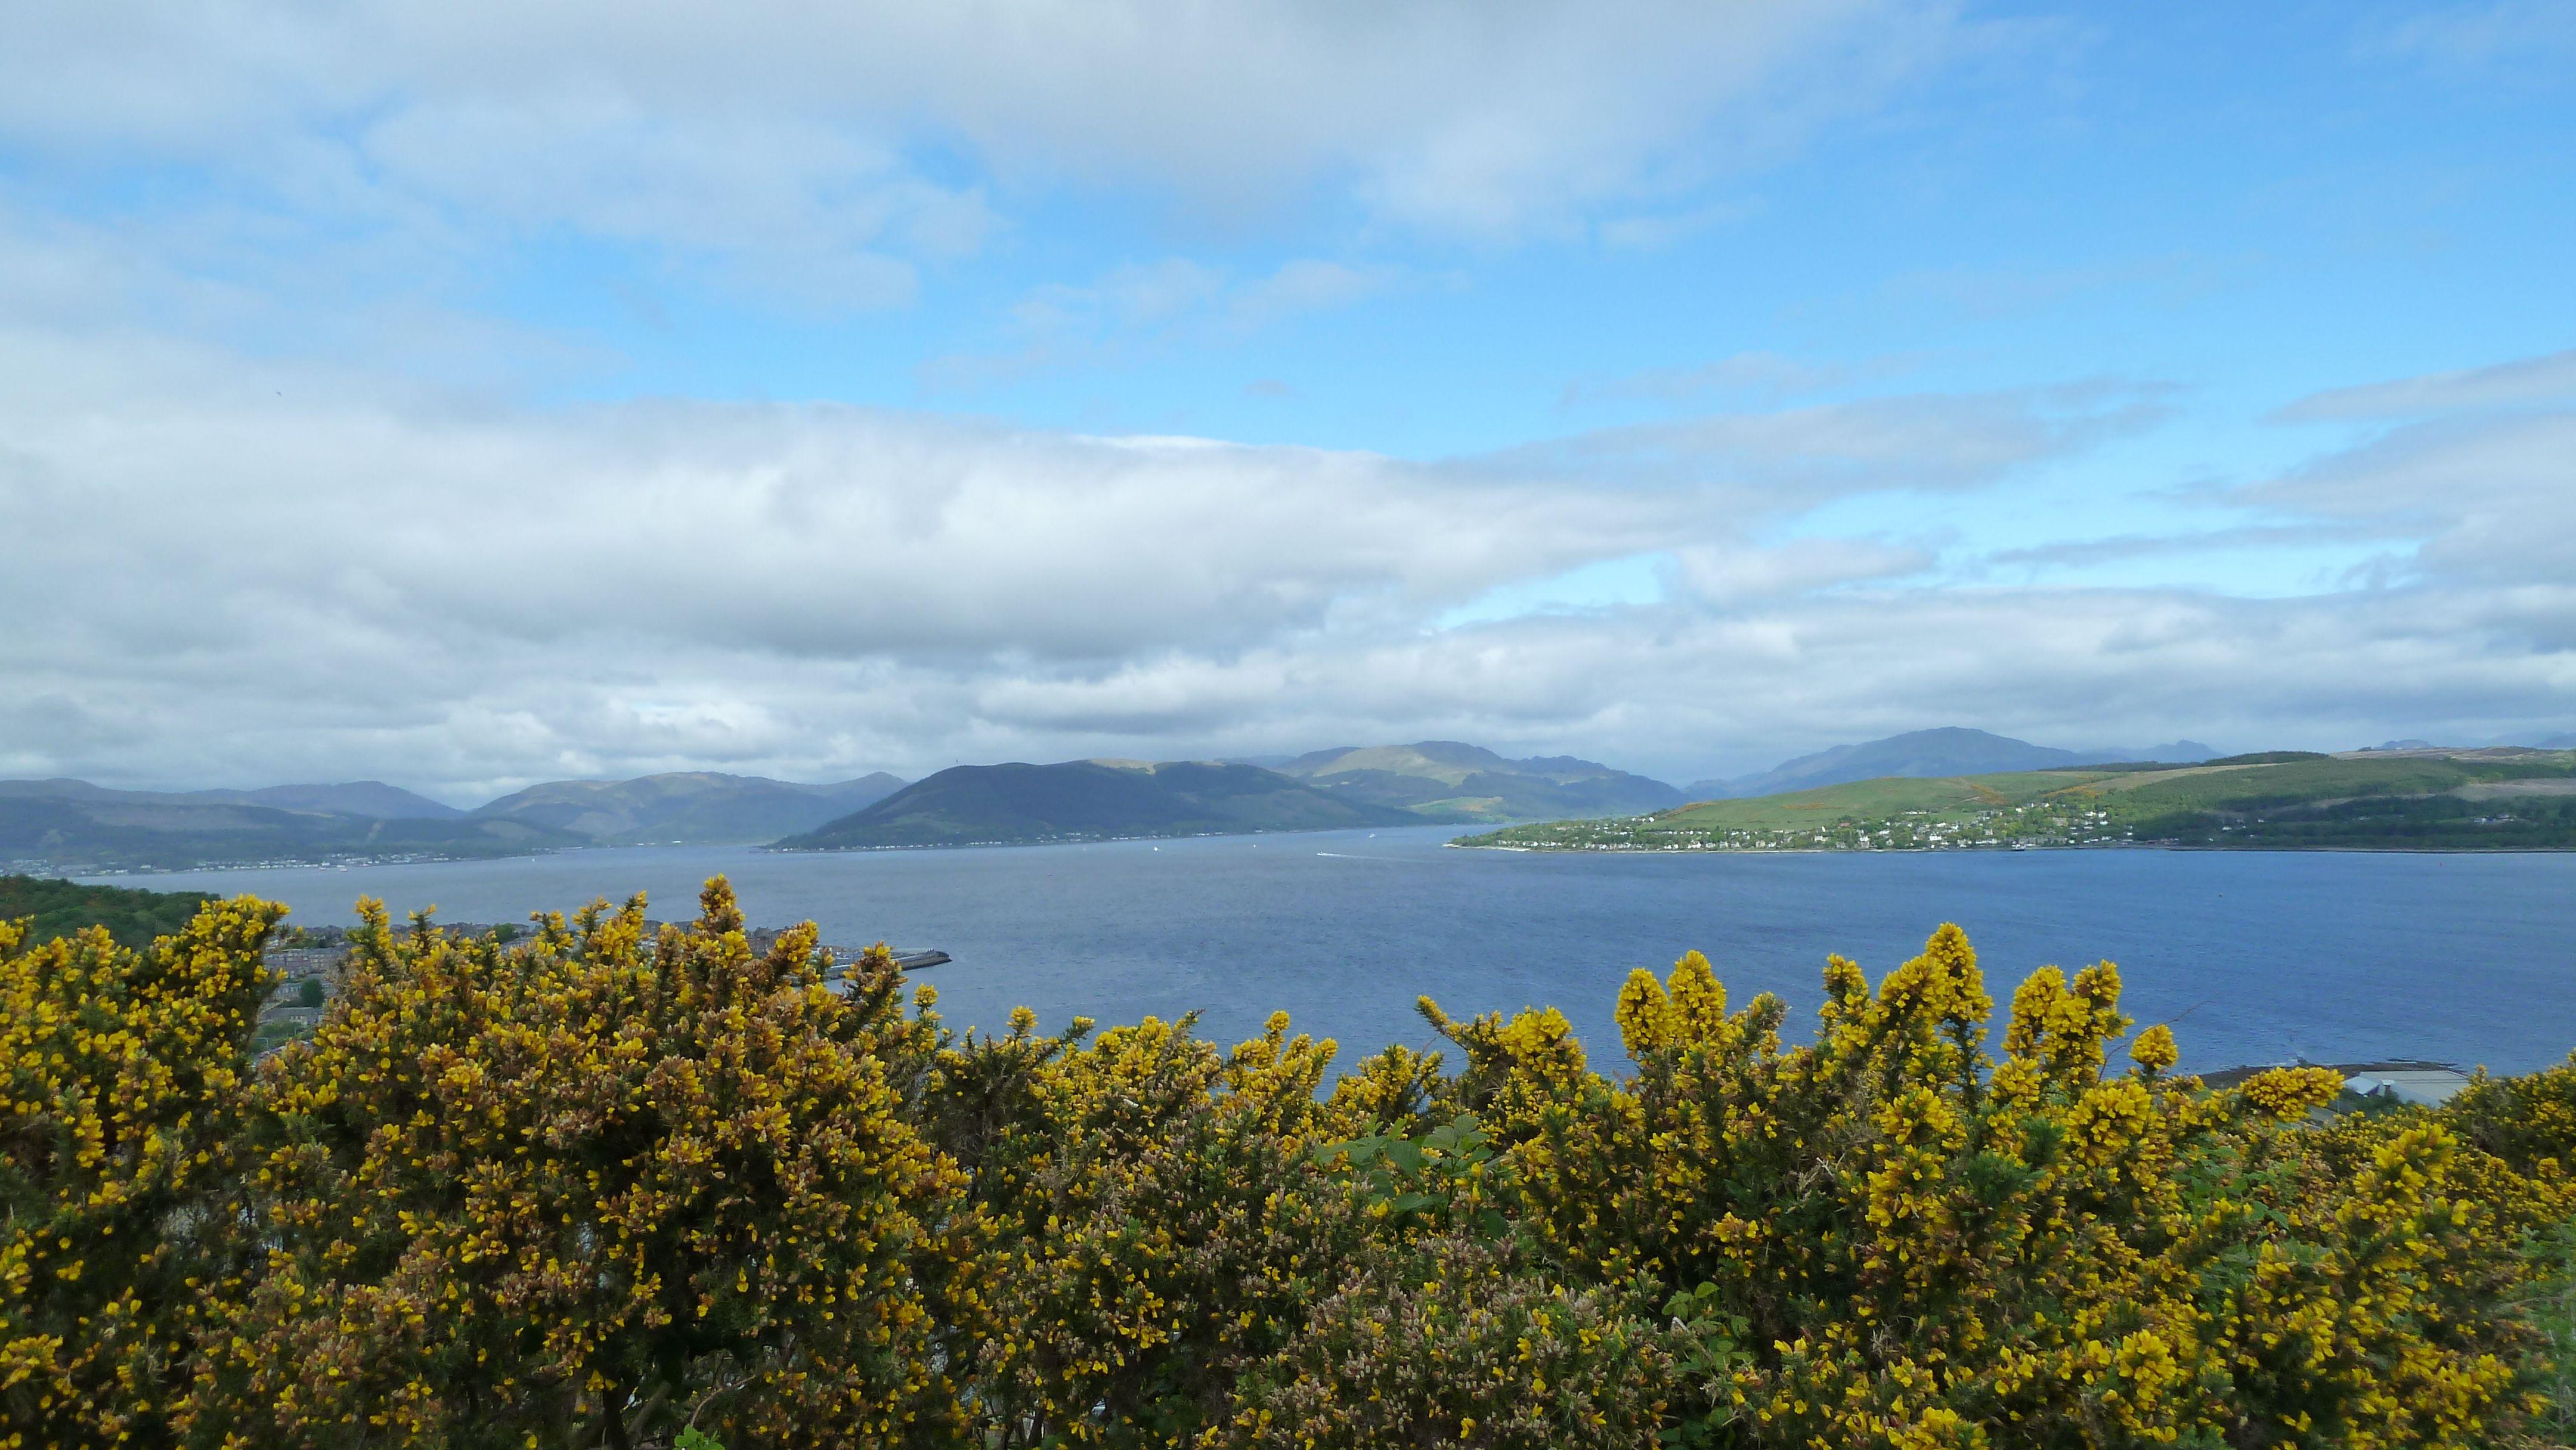 Greenock, Scotland | Travel pictures, Greenock, Natural ...